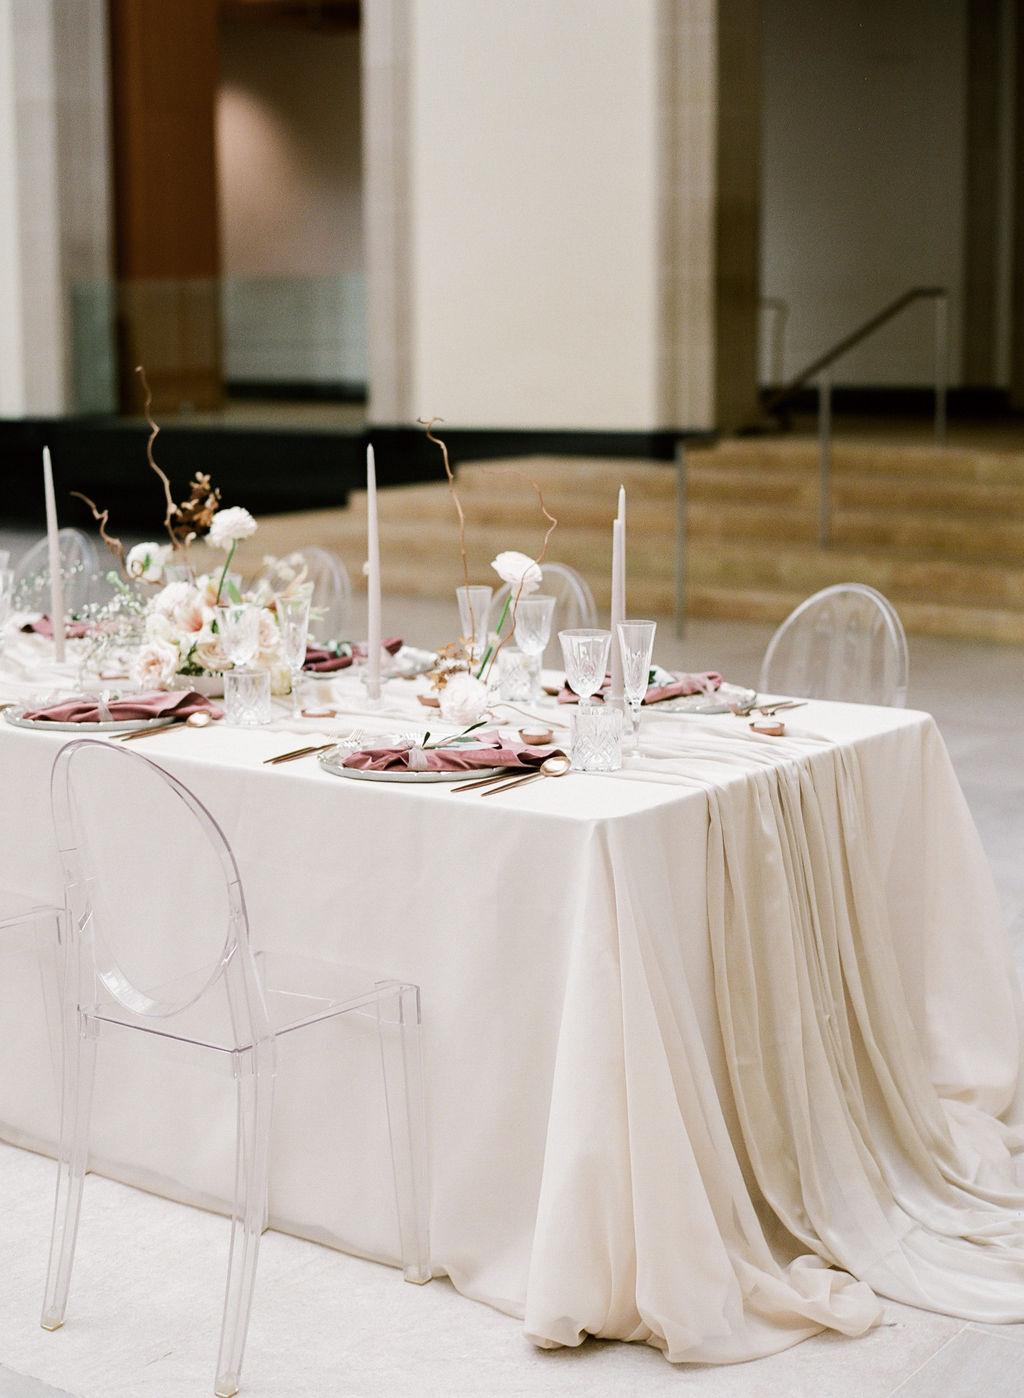 artiese-ago-wedding-editorial-000423600016.jpg